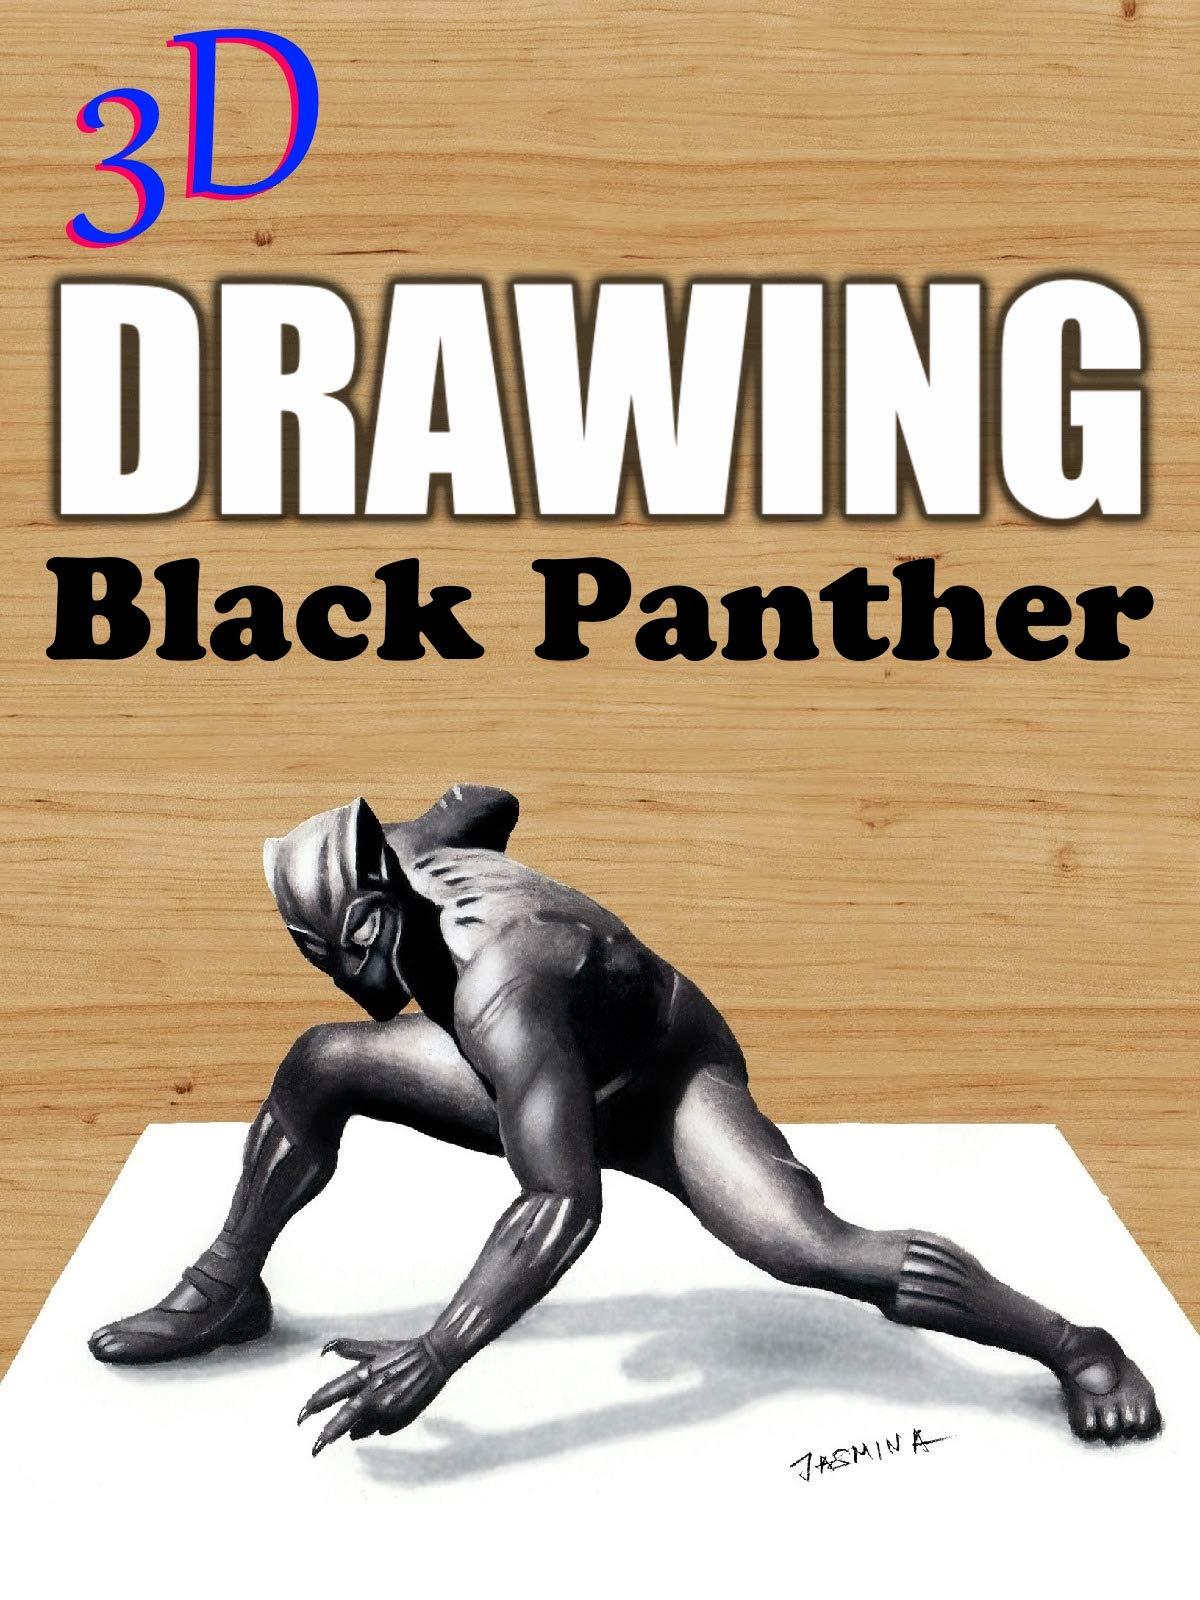 3D Drawing Black Panther